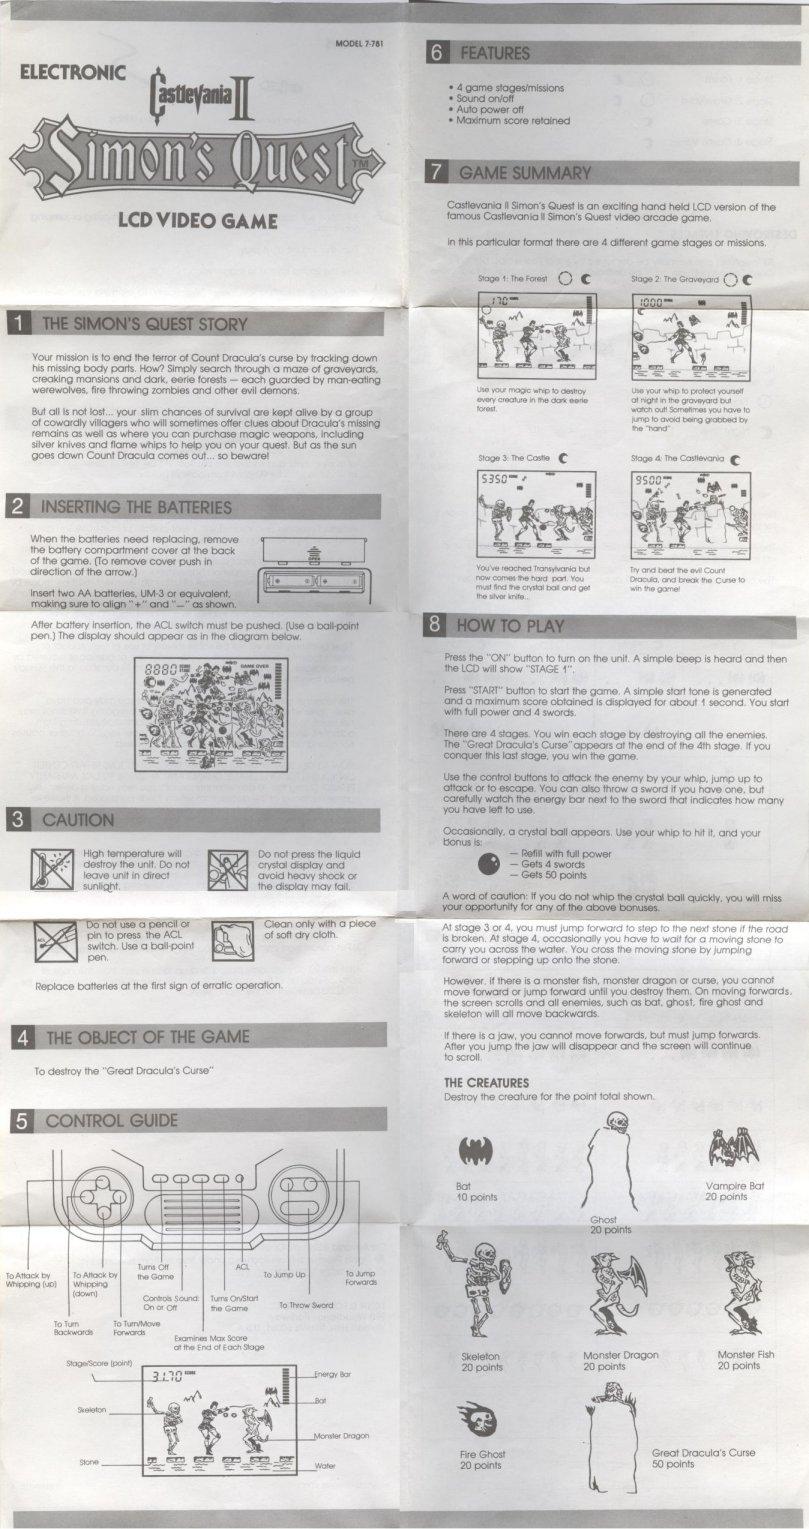 castlevania ii simon s quest tiger handheld rh vgmuseum com Simon's Quest Cartoon Castlevania 2 Simons Quest Online